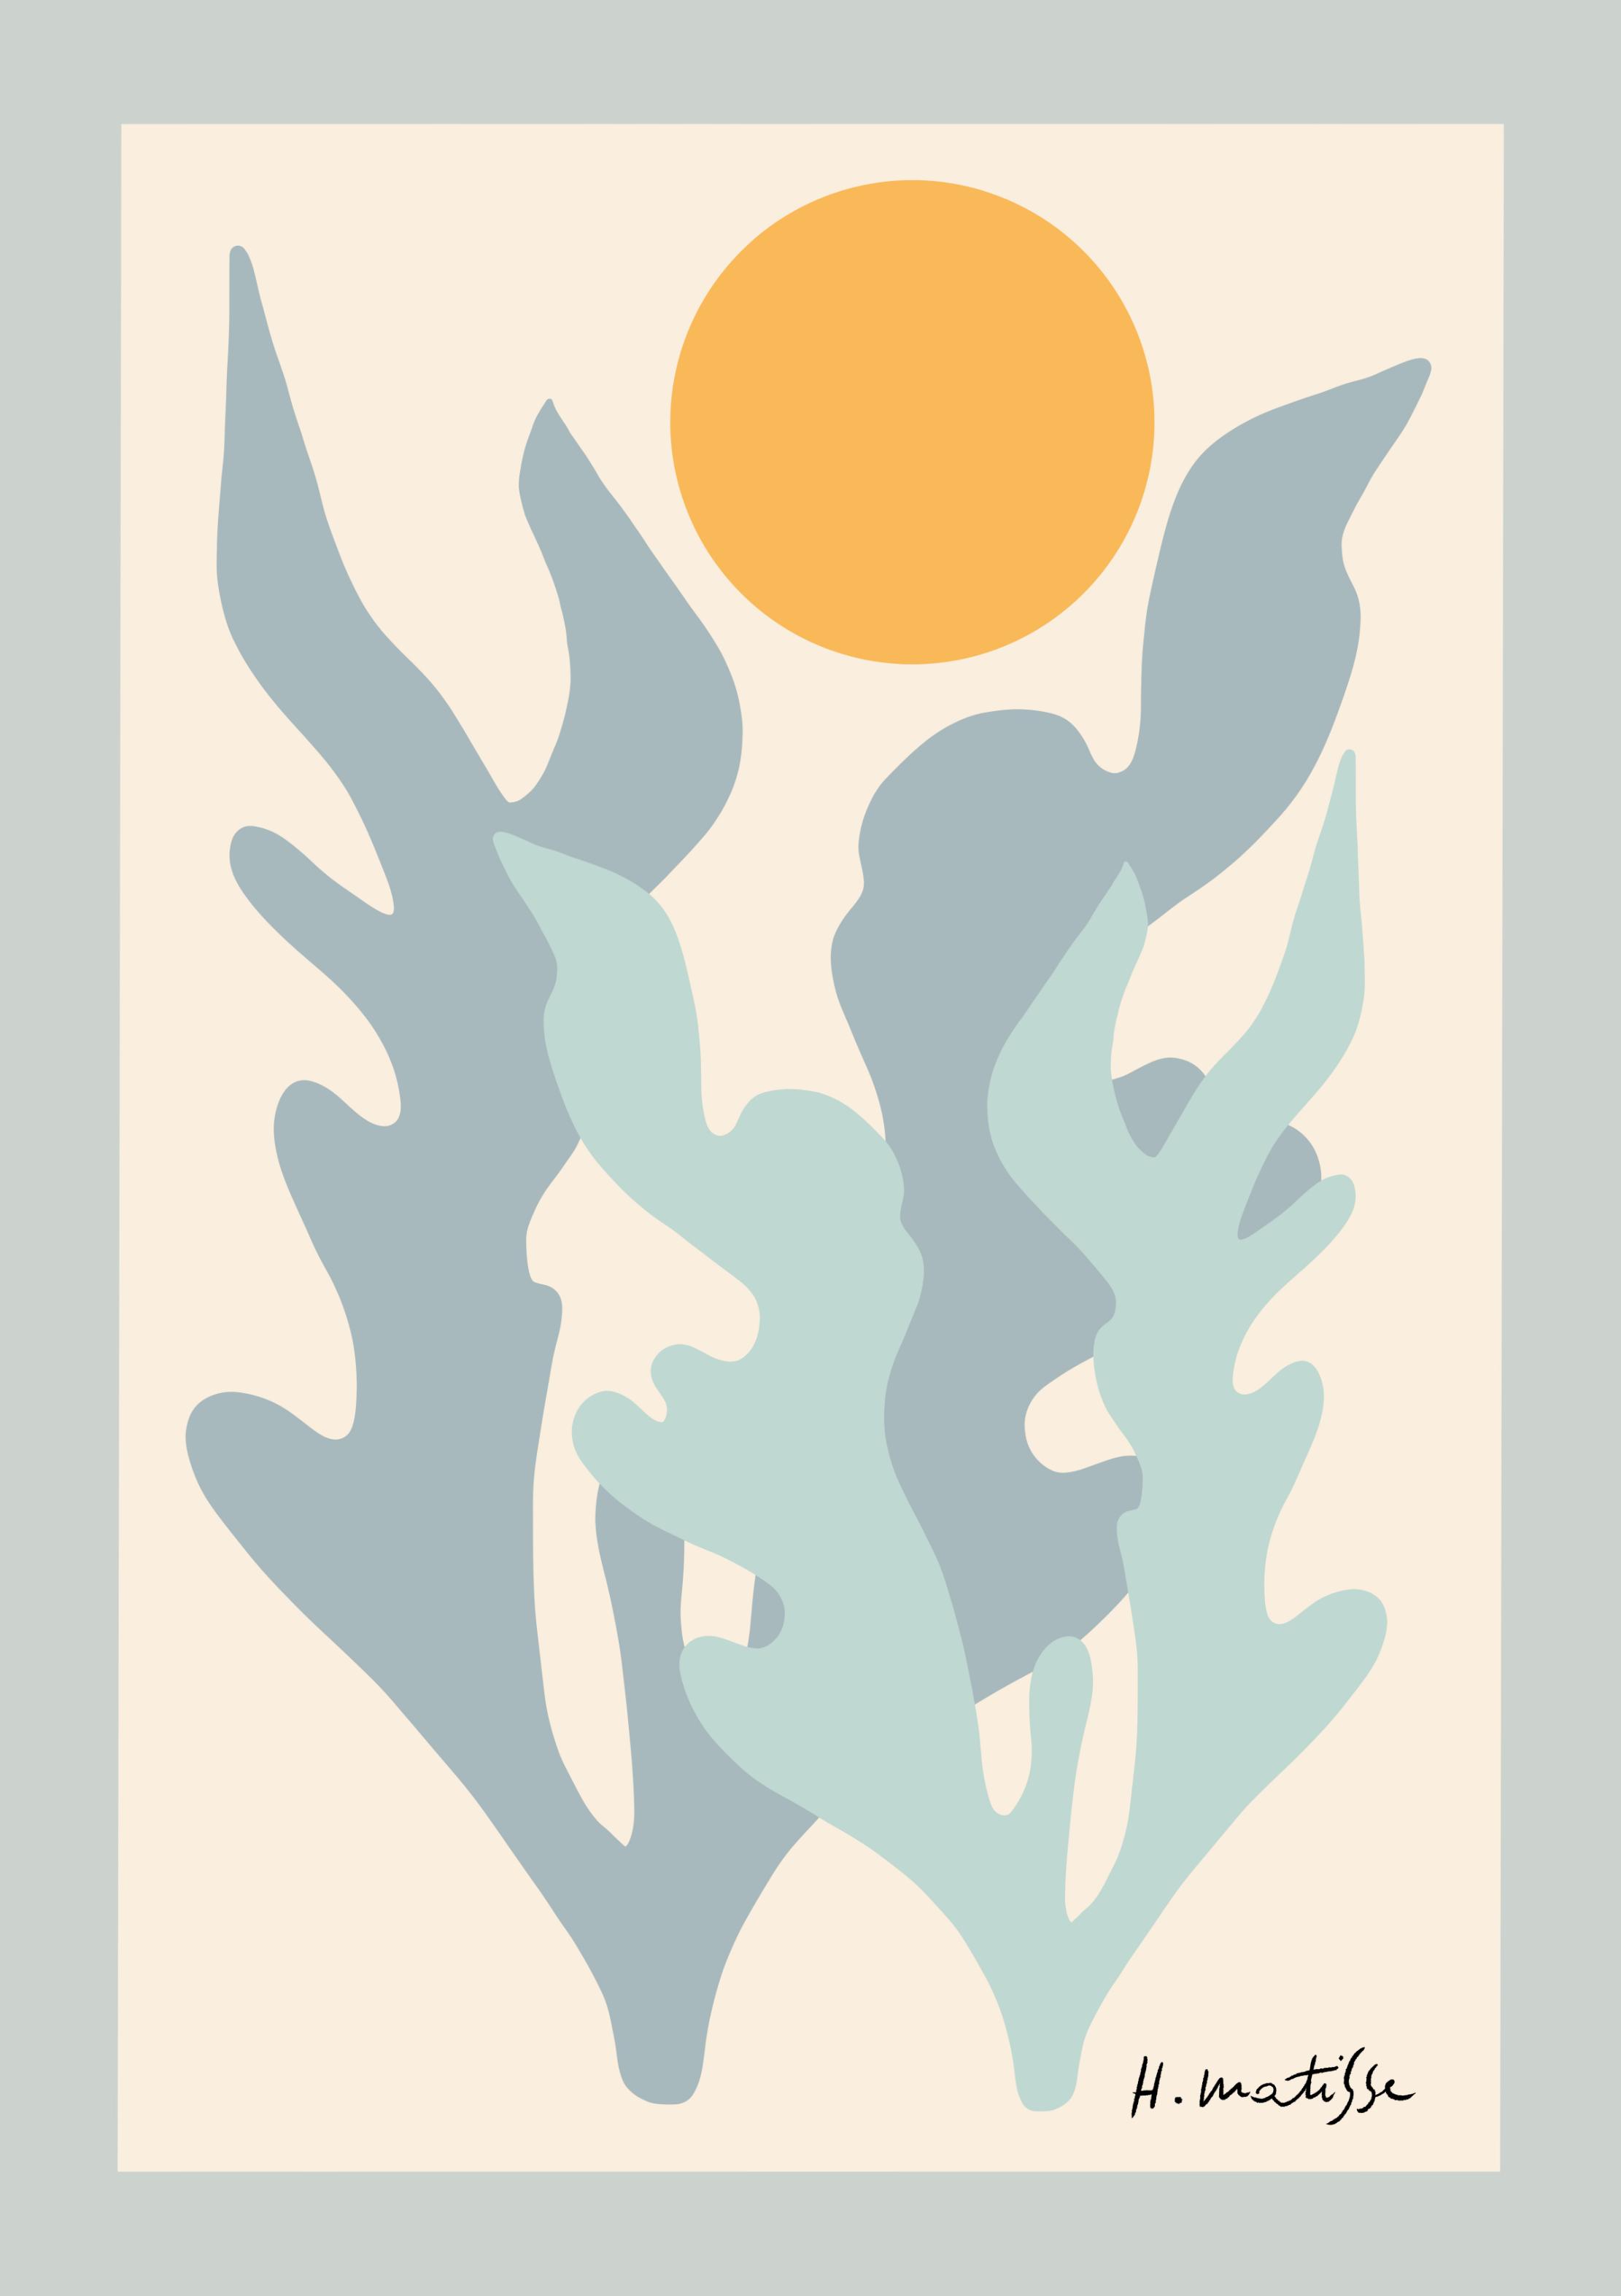 Henri Matisse Posters Shop Wall Art Plakater Tryk Boligindretning Interiordesign Inspiration In 2020 Matisse Art Poster Art Poster Prints